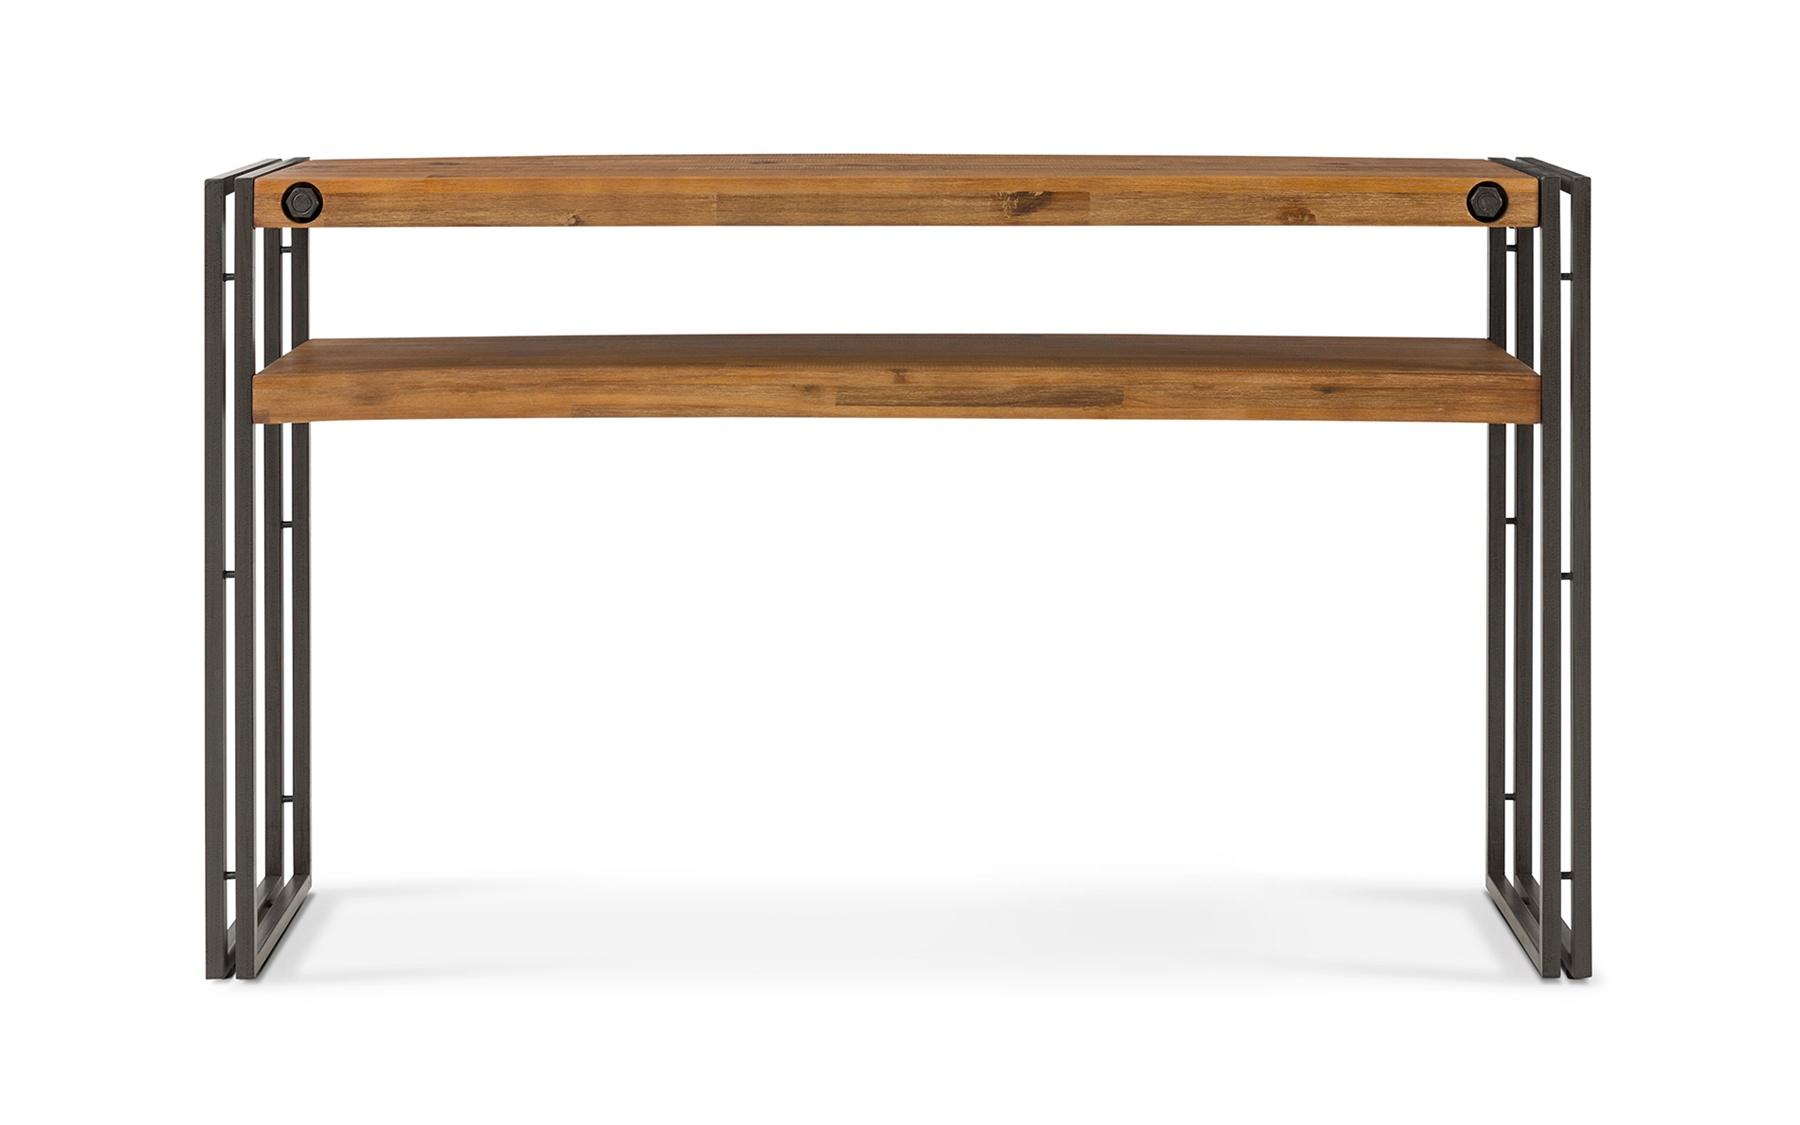 Table console 55x14x32 d263 tables d 39 appoint for Galerie du meuble